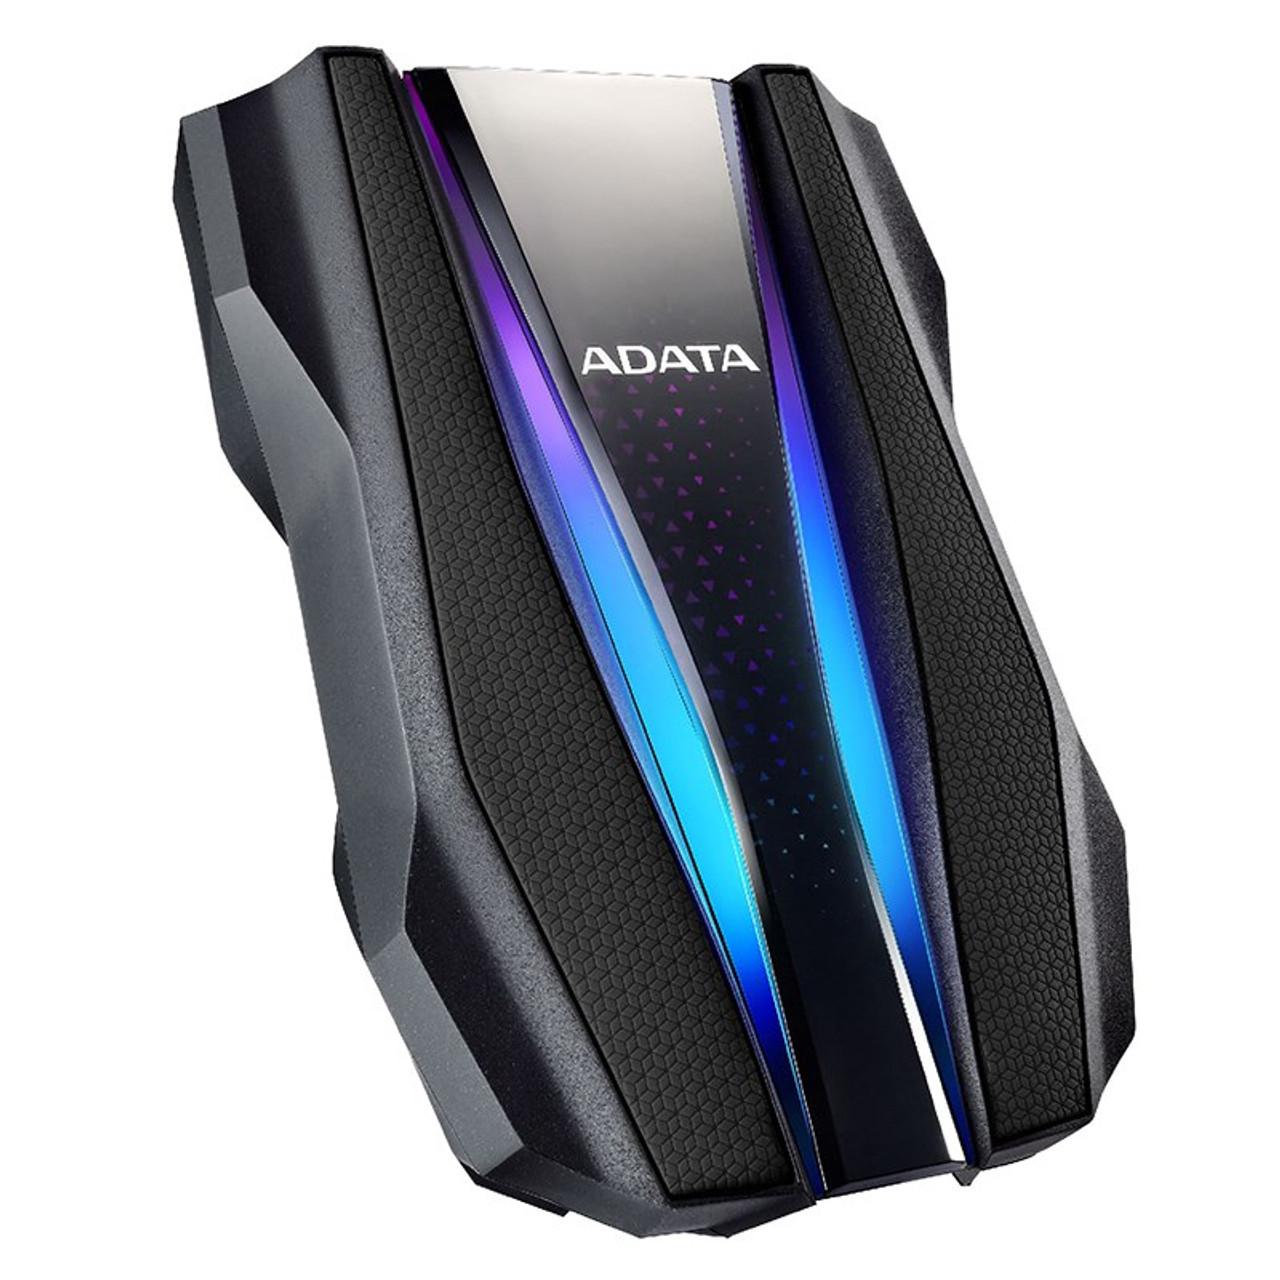 Blue//Black 2TB AData HD720 Waterproof Shockproof USB3.0 Portable 2.5-inch HDD